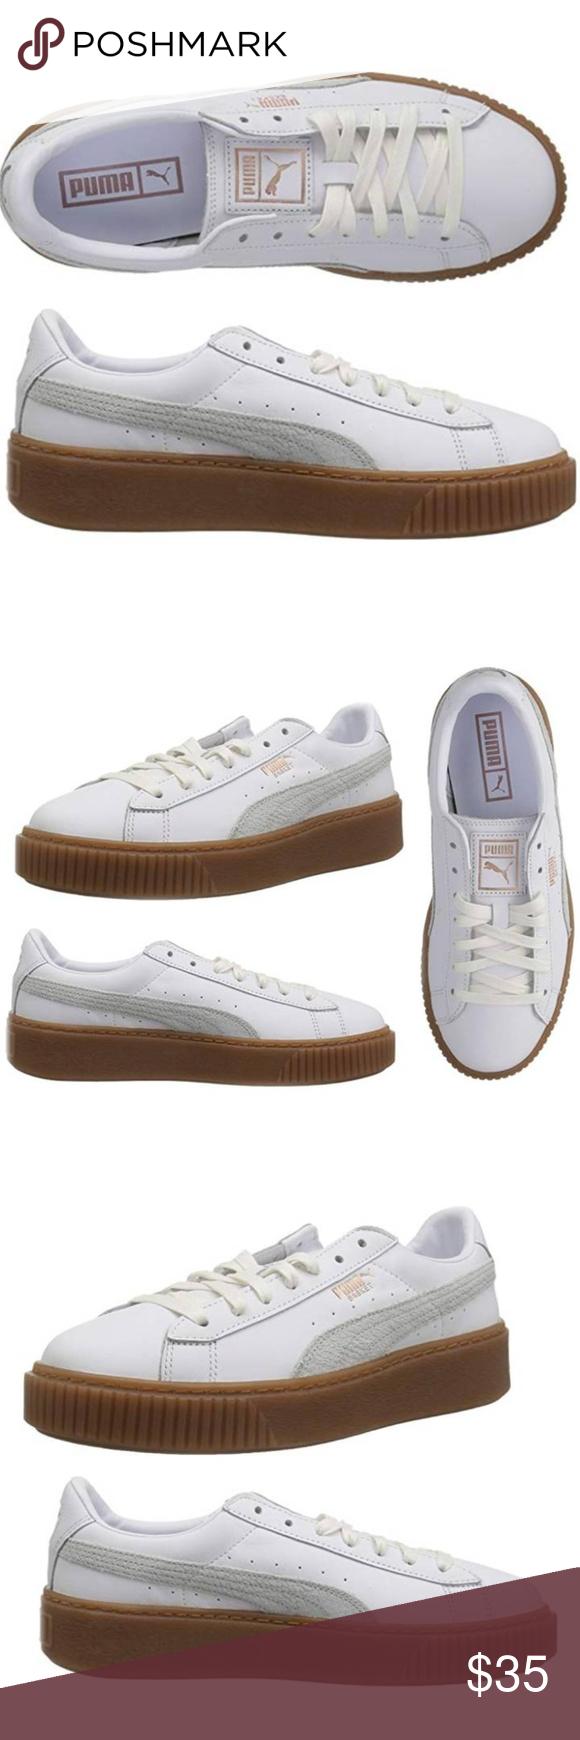 PUMA Women's Platform 100% Leather Sneaker NWT   Leather